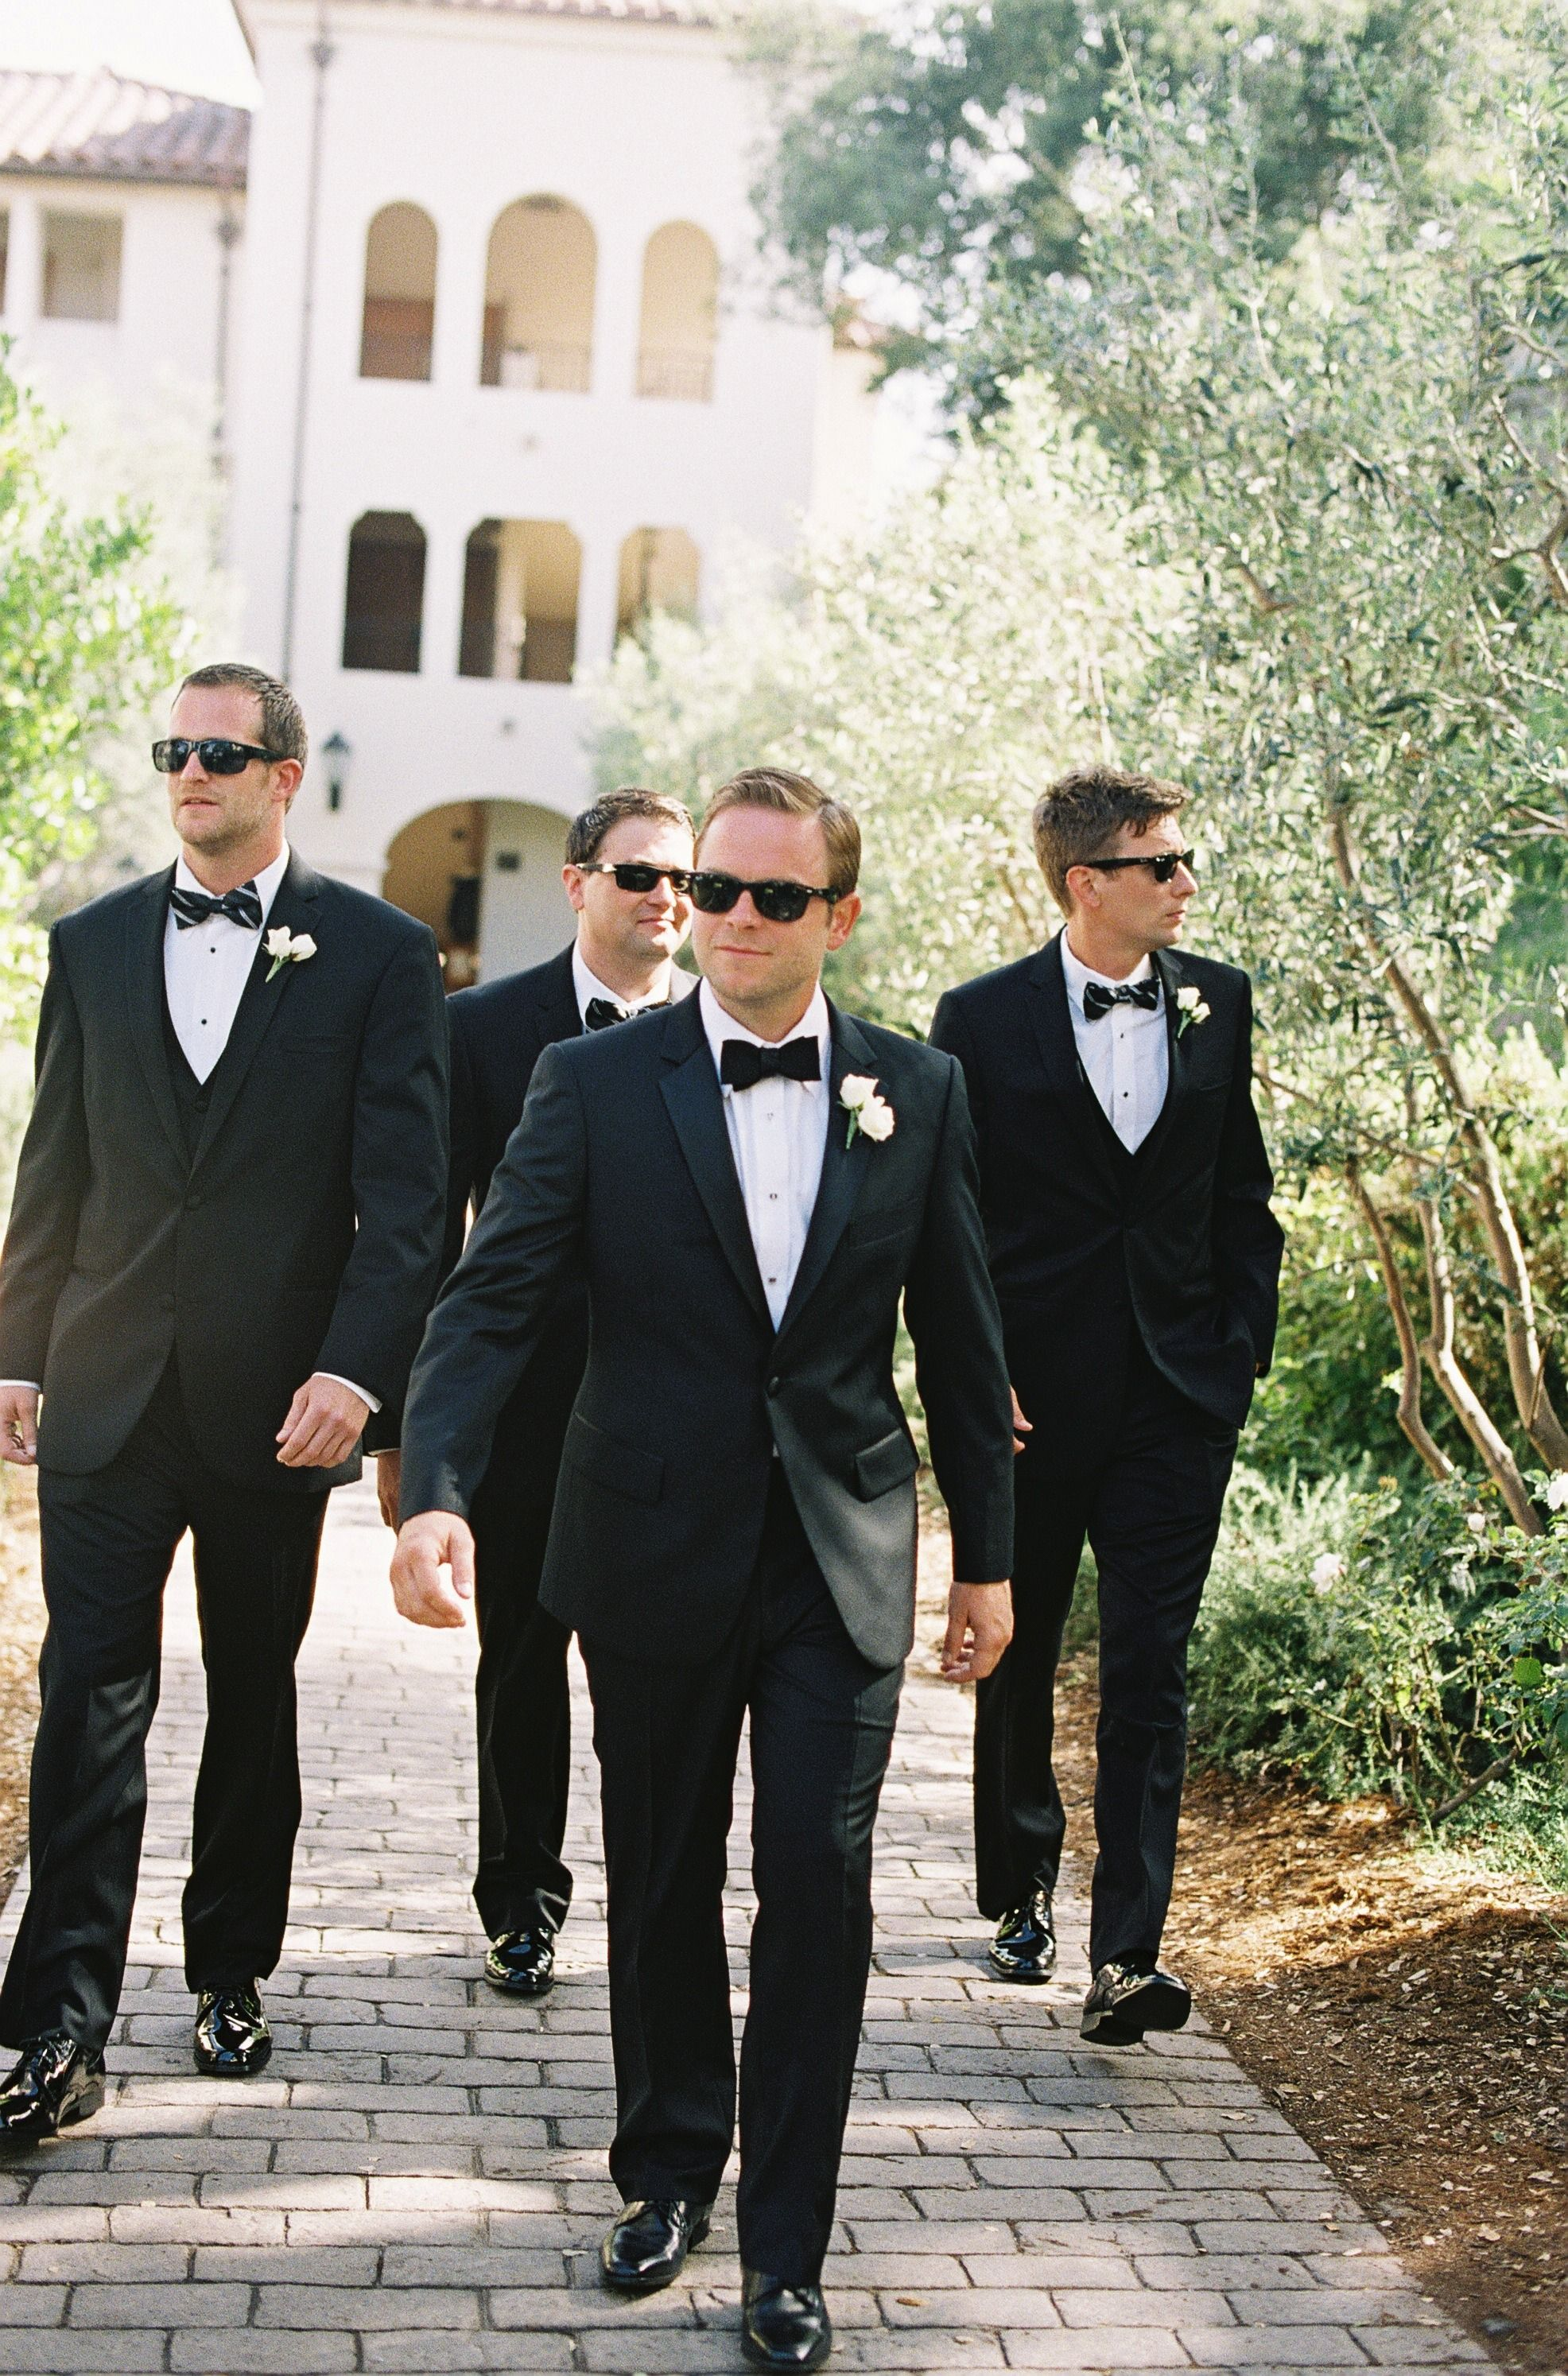 Groom & Groomsmen - http://www.StyleMePretty.com/2014/03/20/classic-white-wedding-at-bacara-resort/ Patrick Moyer Photography on #SMP